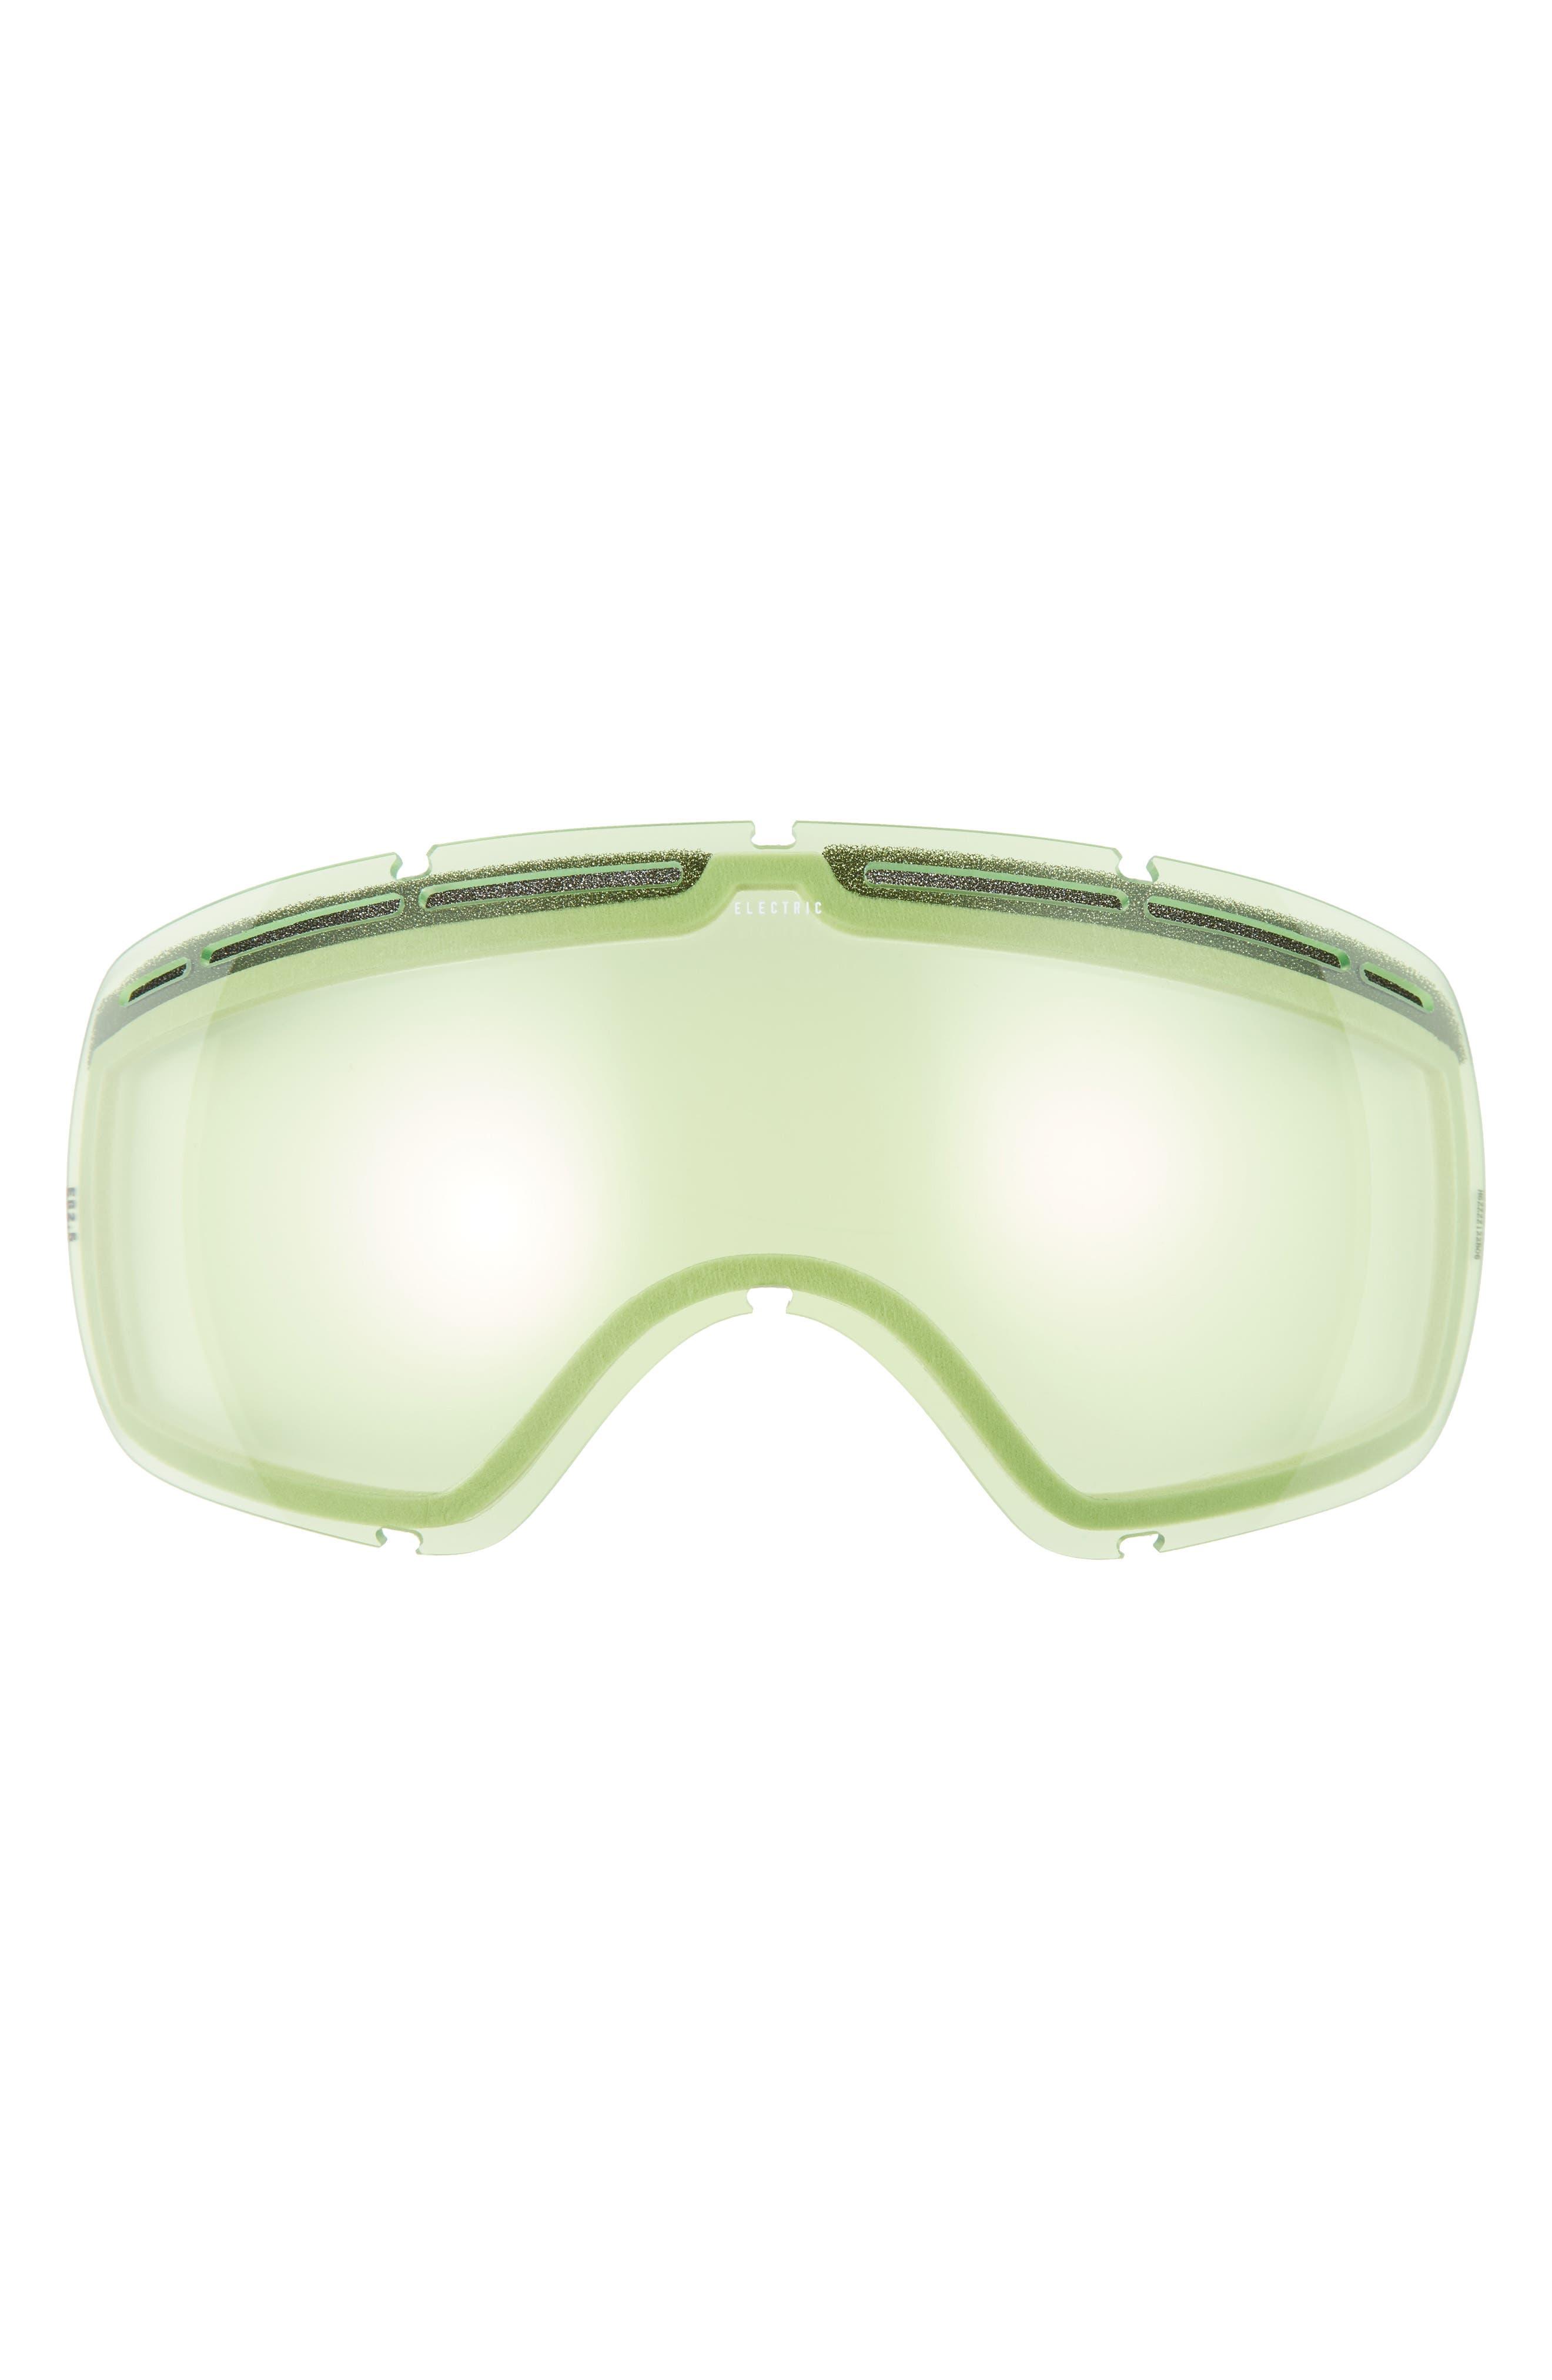 EG 2.5 215mm Snow Goggles,                             Alternate thumbnail 20, color,